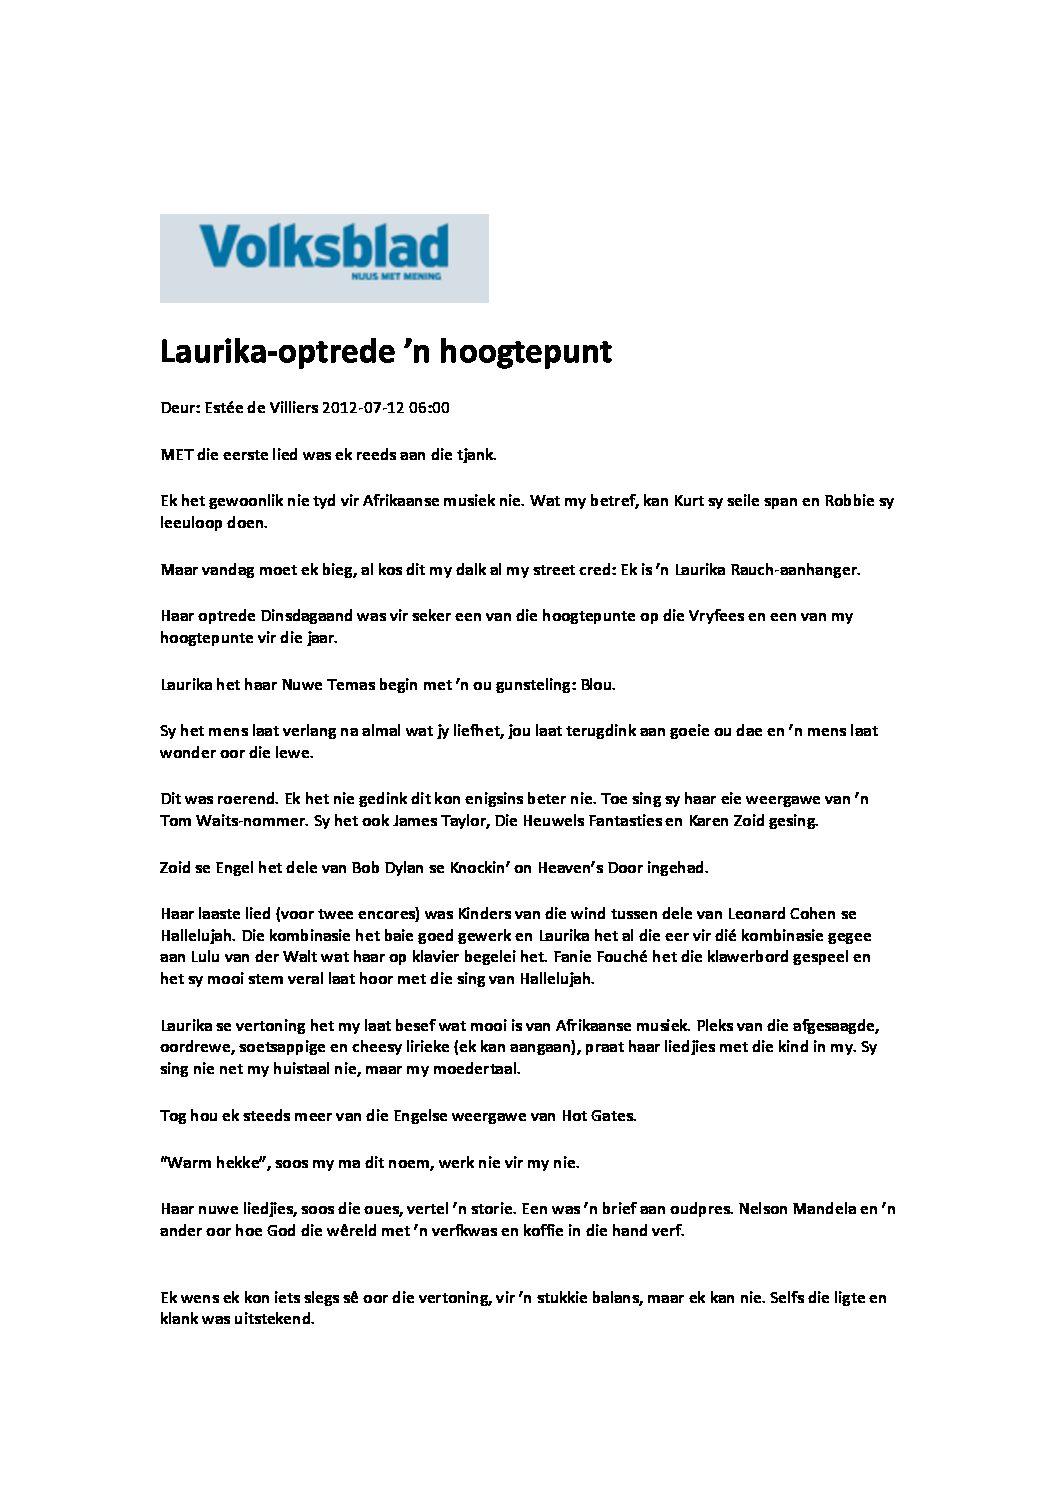 VOLKSBLAD-ARTIKEL